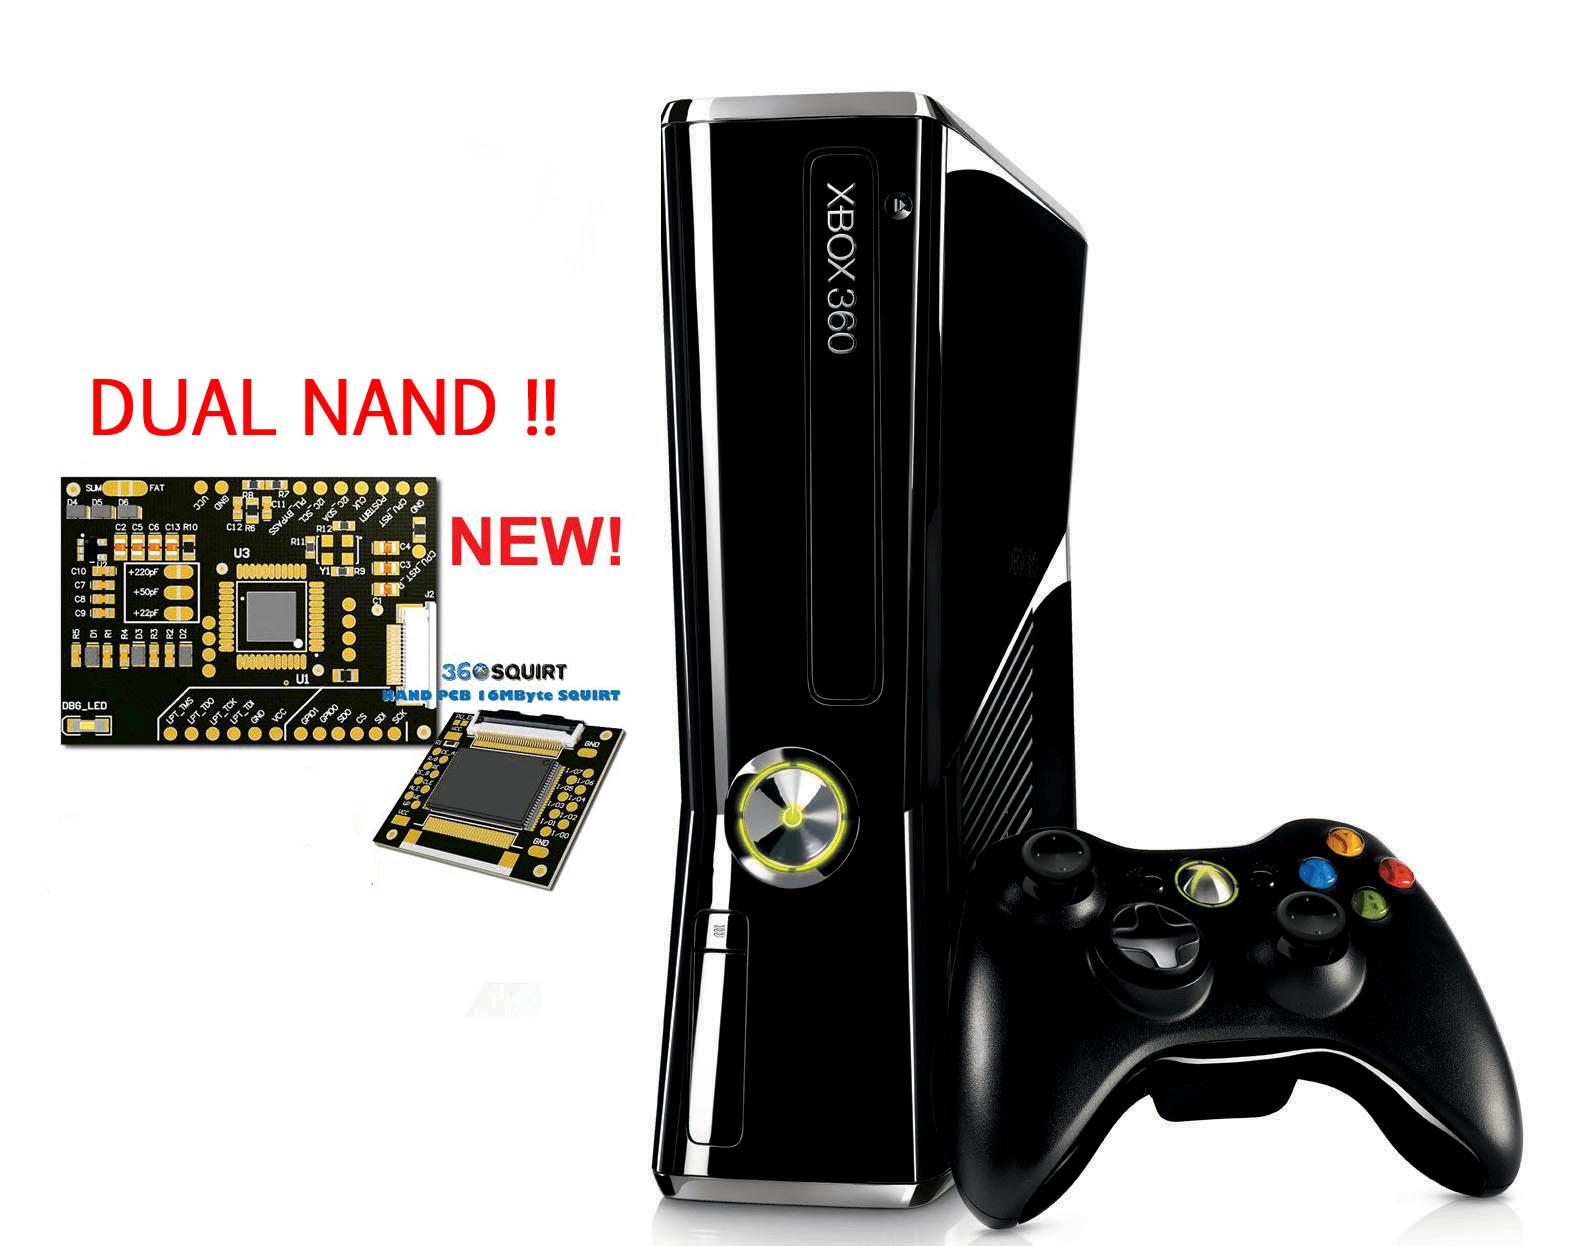 Modifica Xbox 360 | RGH + Dual Nand + DashLaunch + Freestyle + XEX Menu